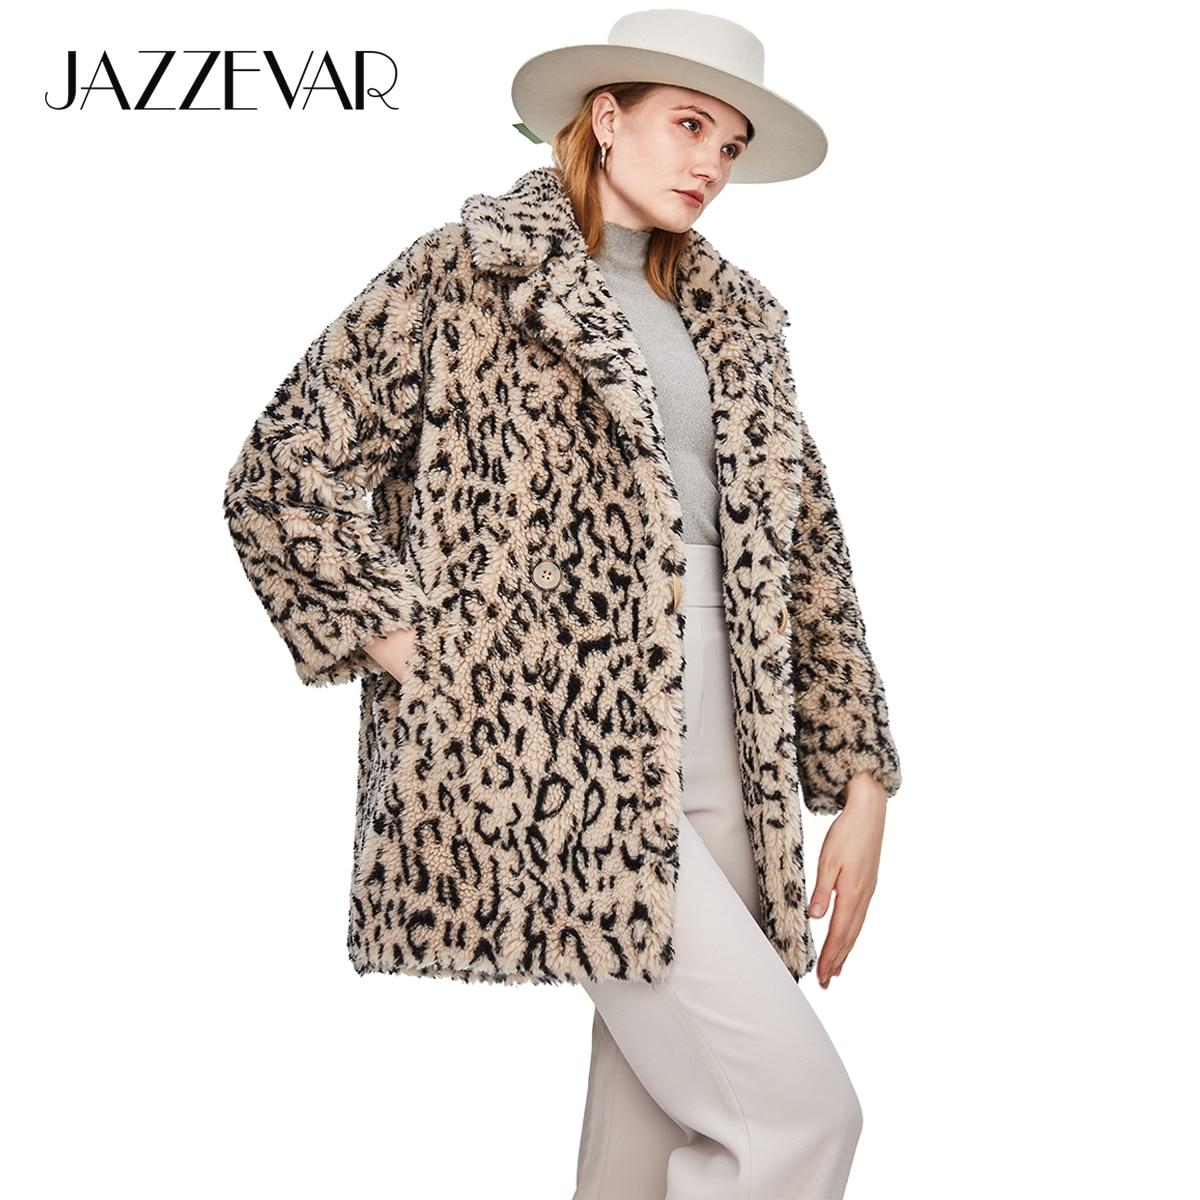 JAZZEVAR 2019 Winter New Fashion Womens Teddy Bear Icon Coat Classic Real Sheep Fur Oversized Jacket Thick Warm Outerwear J8003